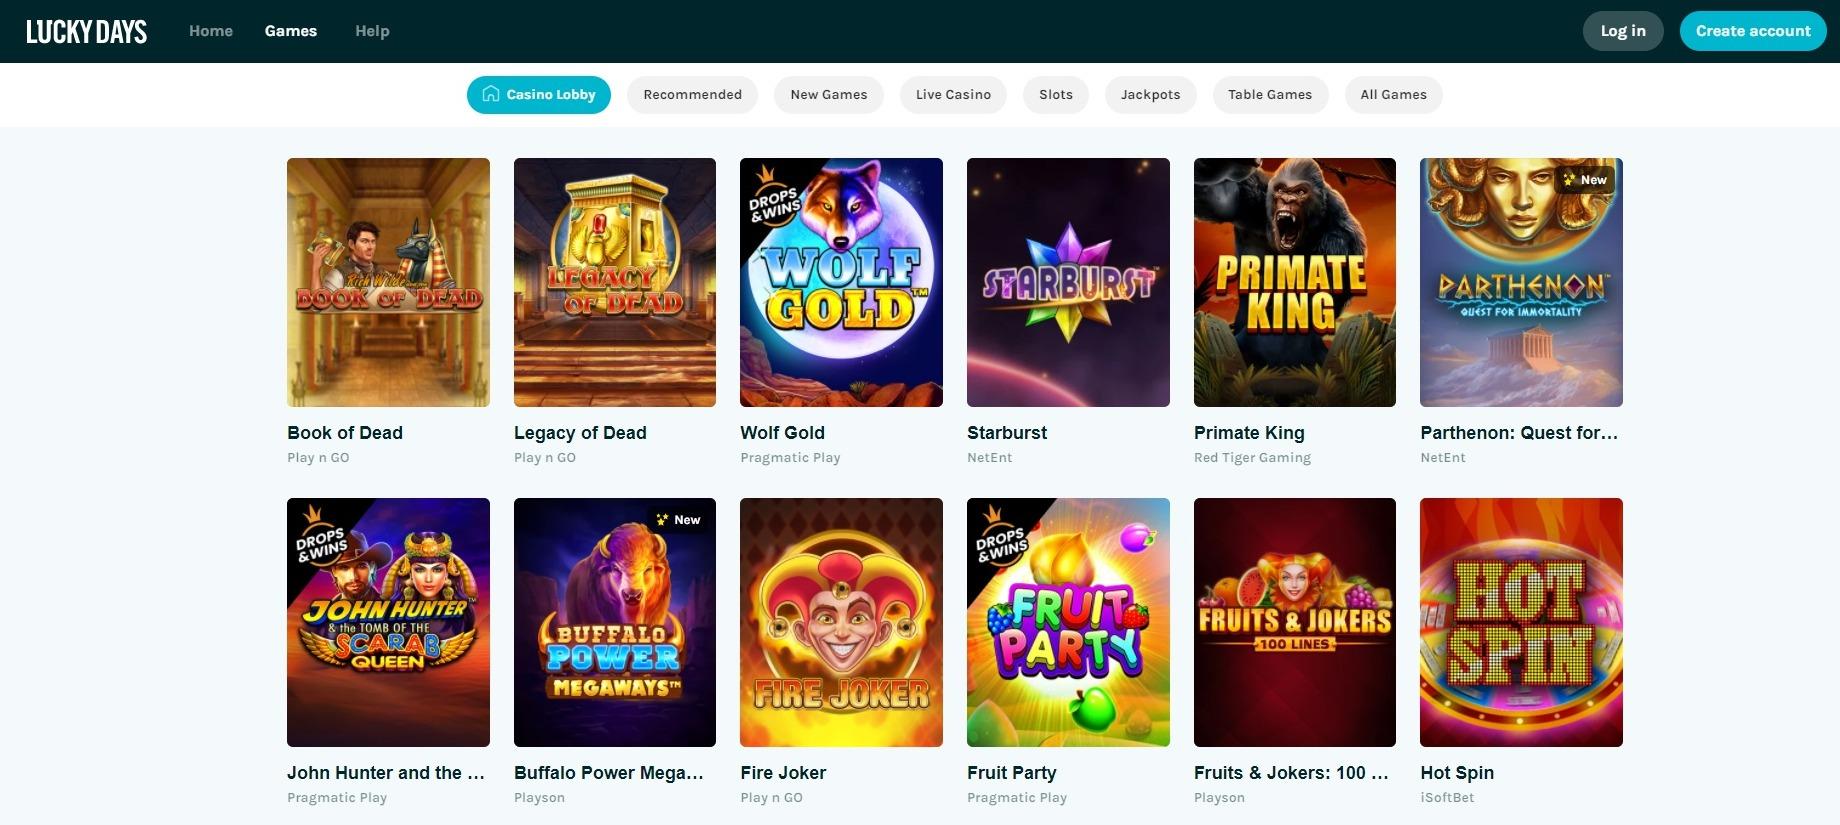 luckydays casino games